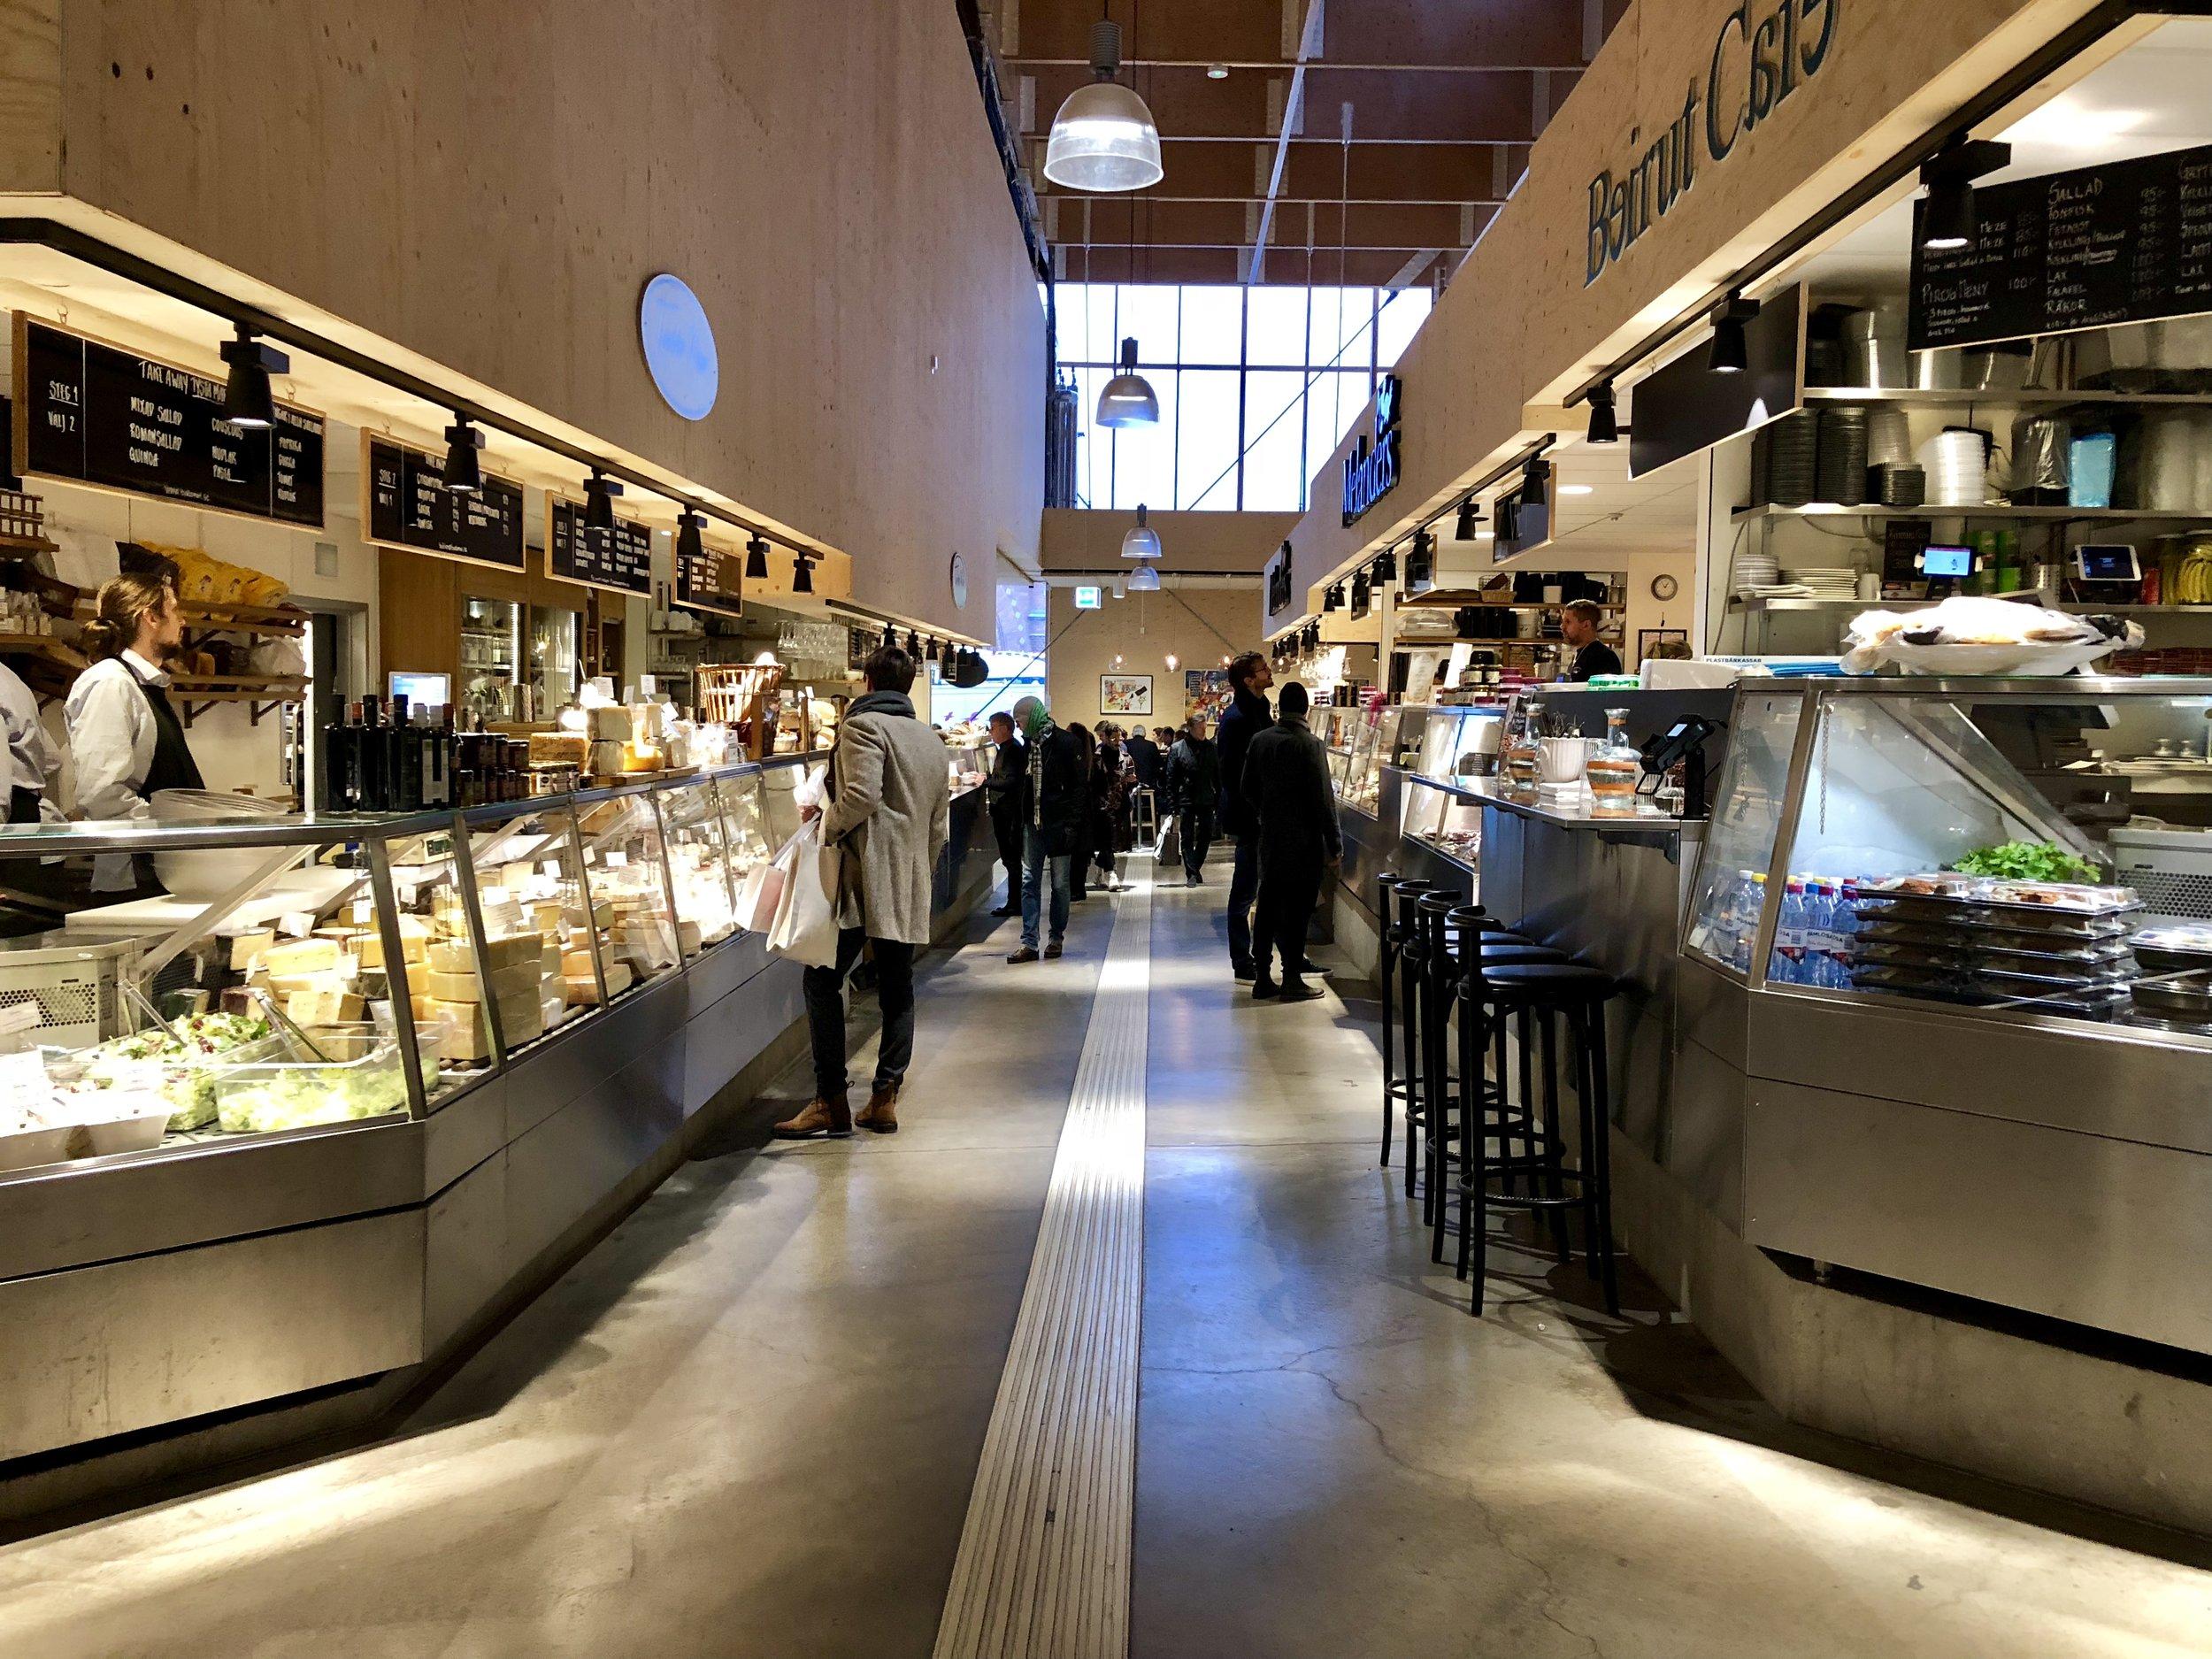 Östermalm's Market Hall